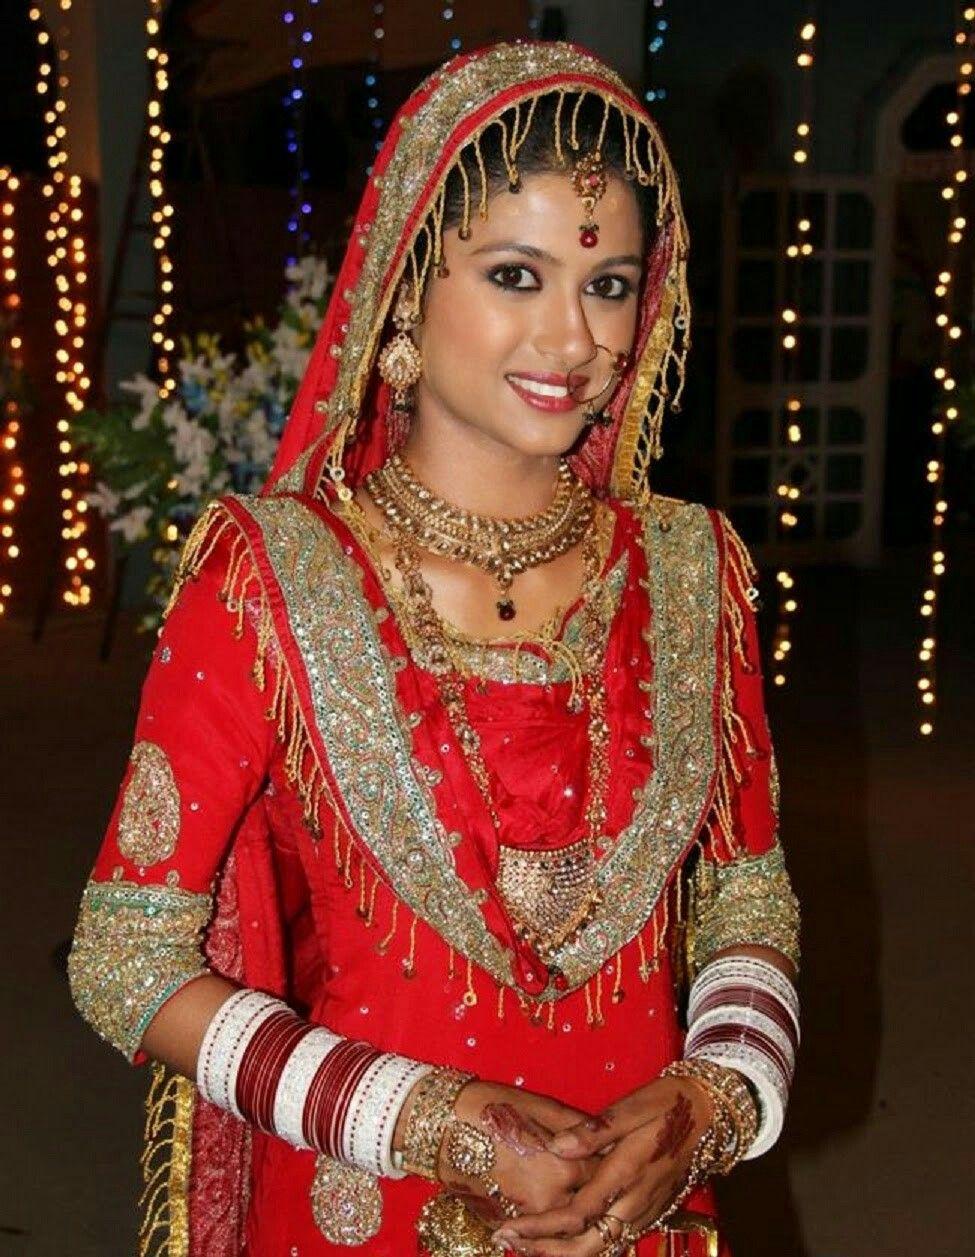 Watch Yukti Kapoor 2011 video